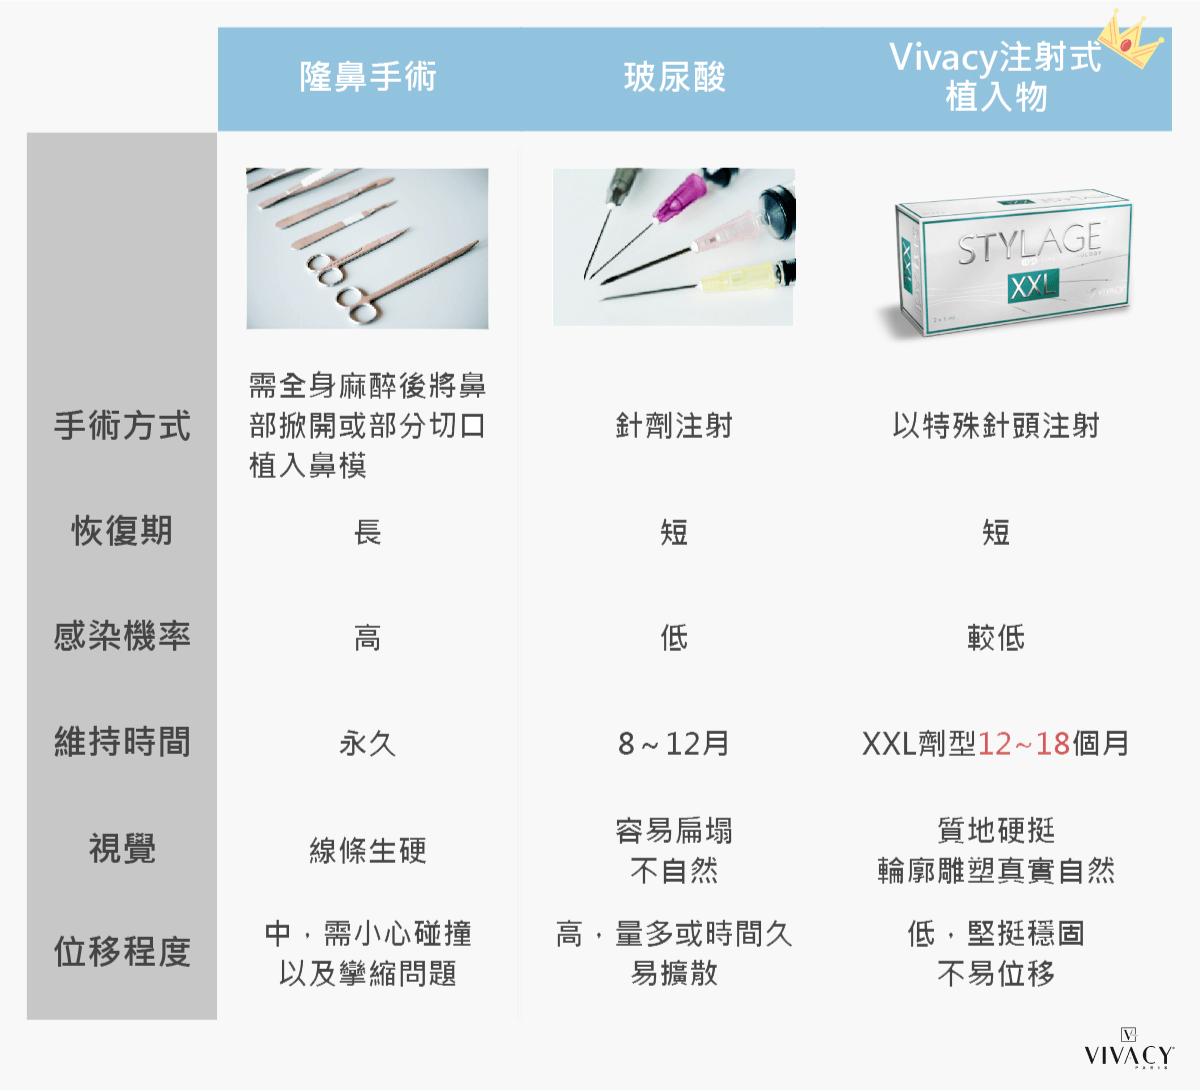 vivacy玻尿酸隆鼻比較